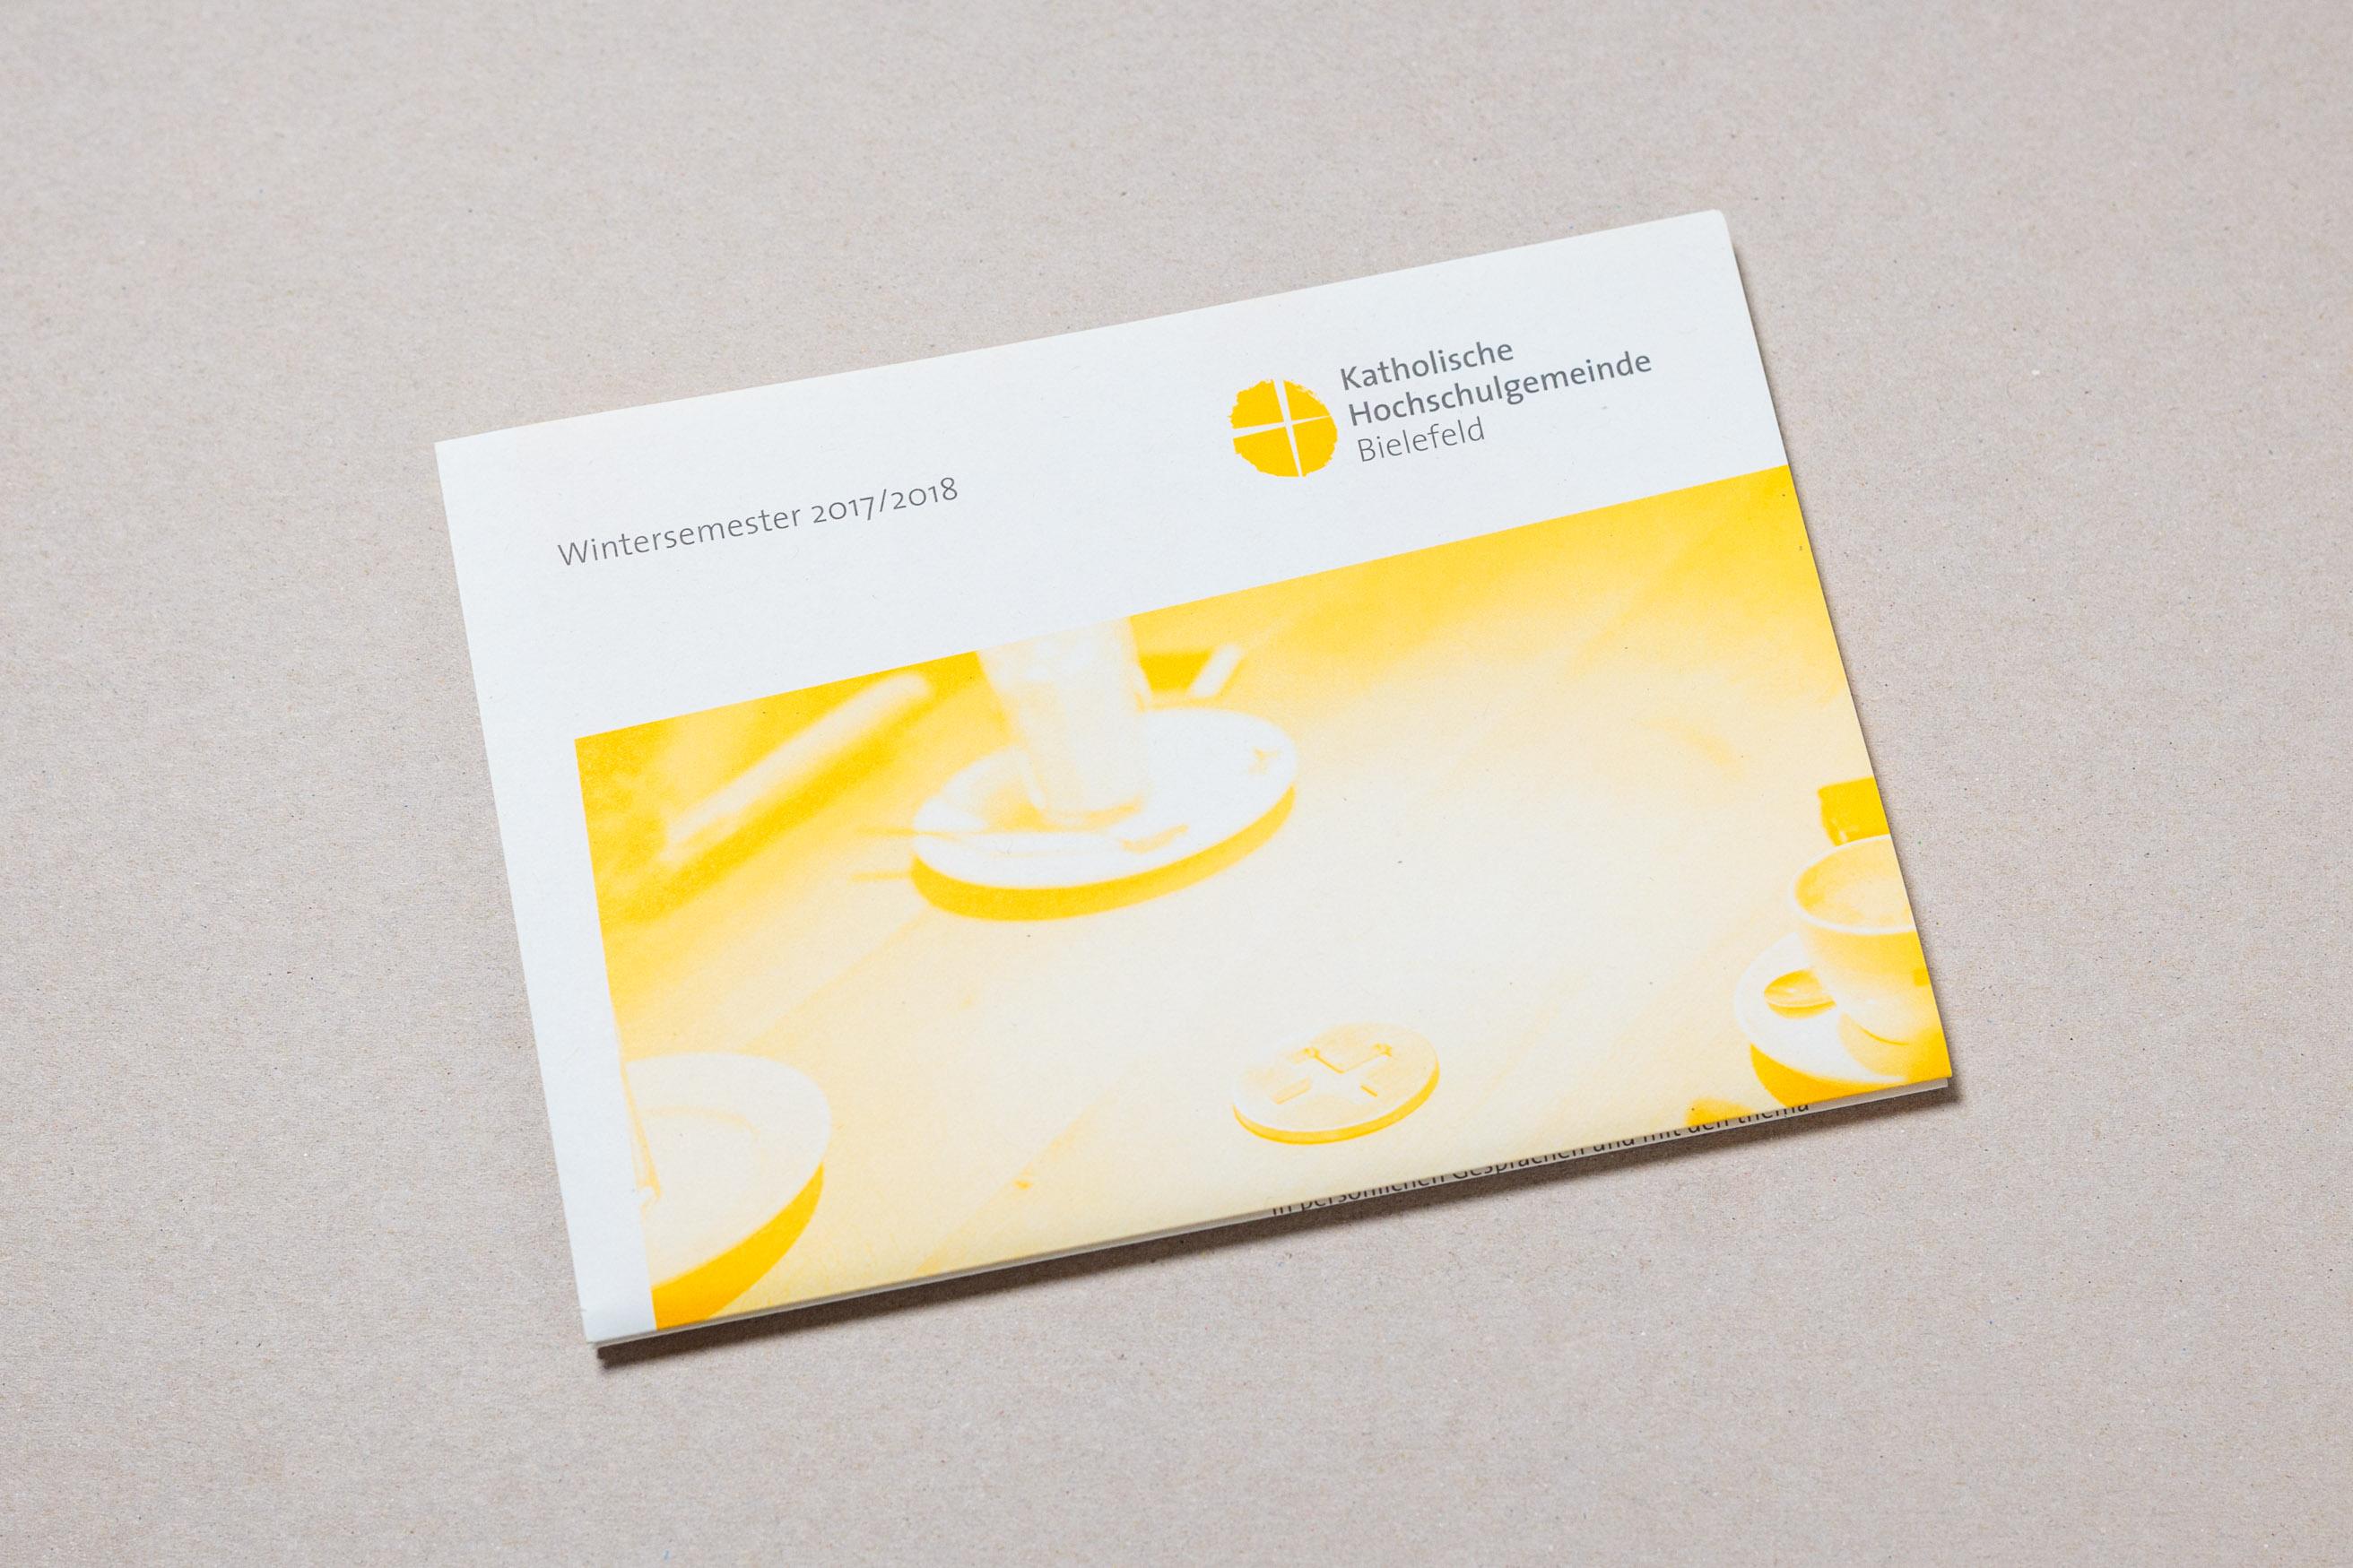 KHG Bielefeld Semesterprogramm, Cover